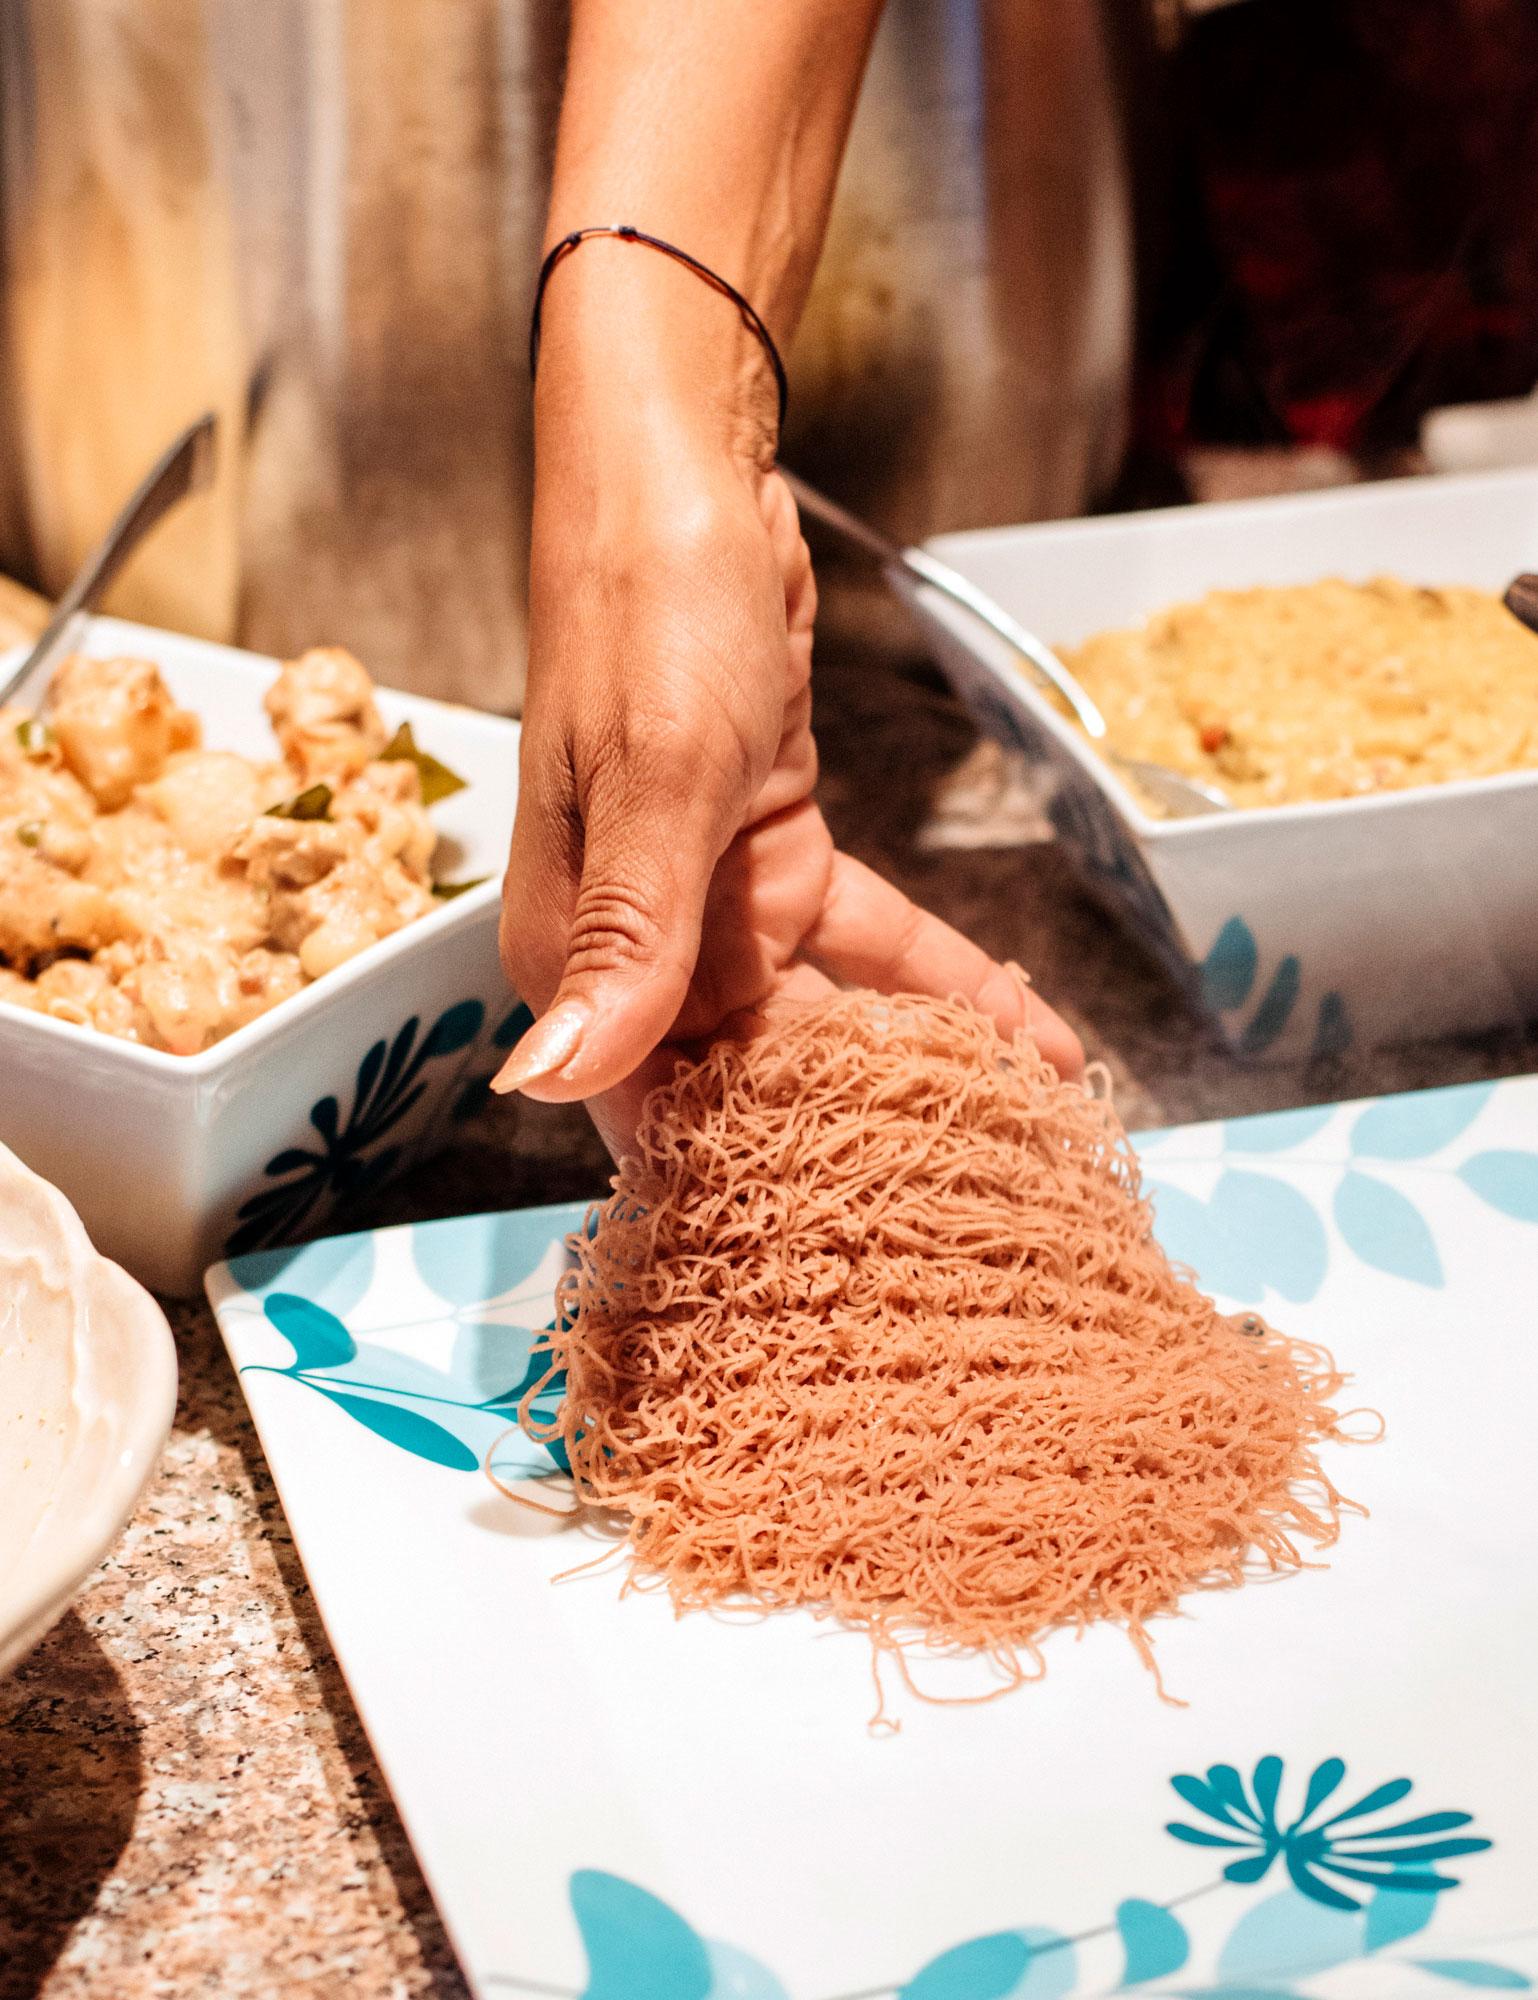 Los_Angeles_Food_photographer_Rebecca_Peloquin_Sri_Lankan_Food_022.JPG